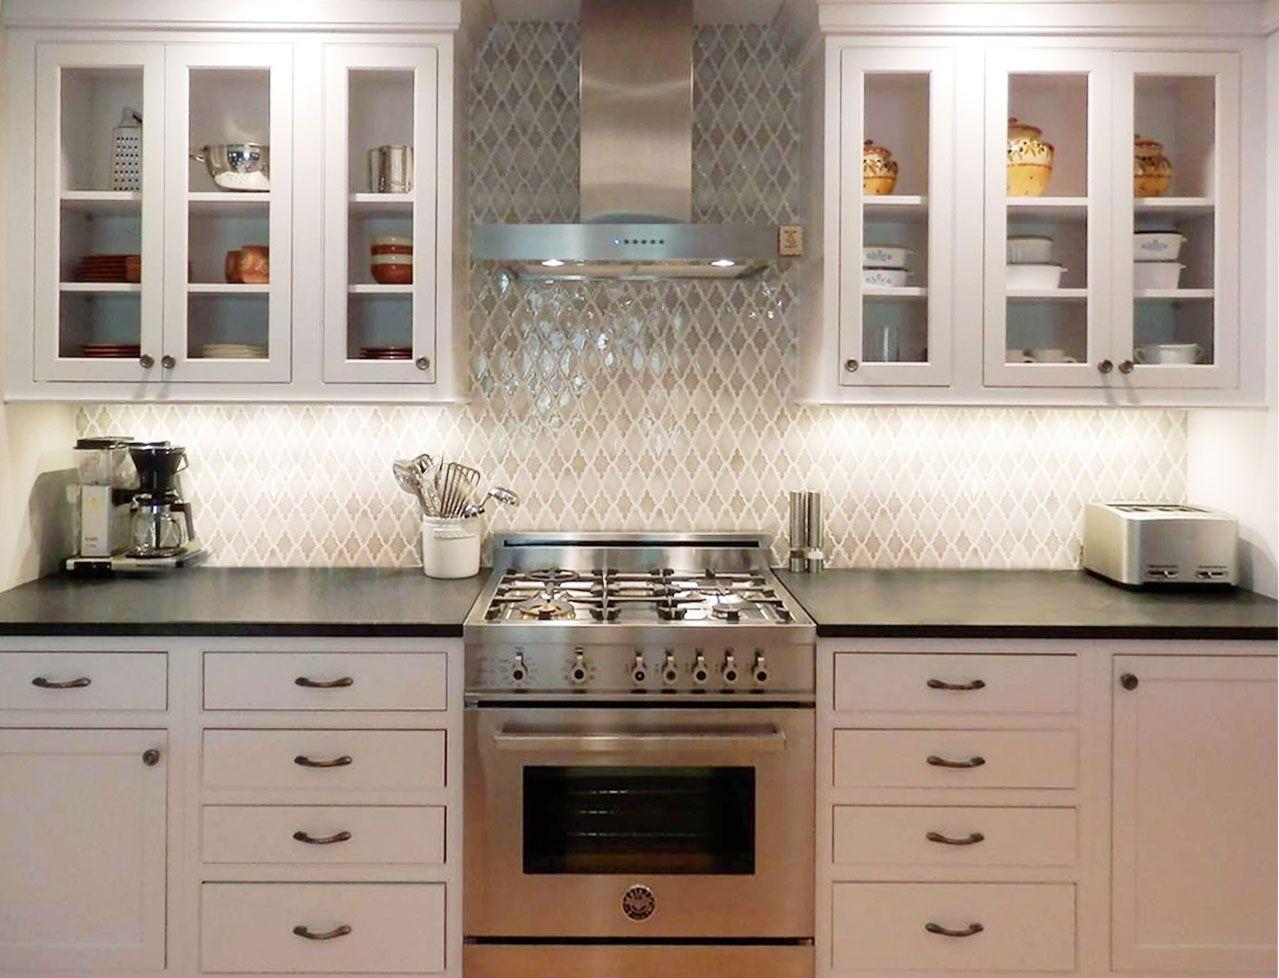 Arabesque mosaic encore ceramics tile style pinterest arabesque mosaic encore ceramics doublecrazyfo Gallery